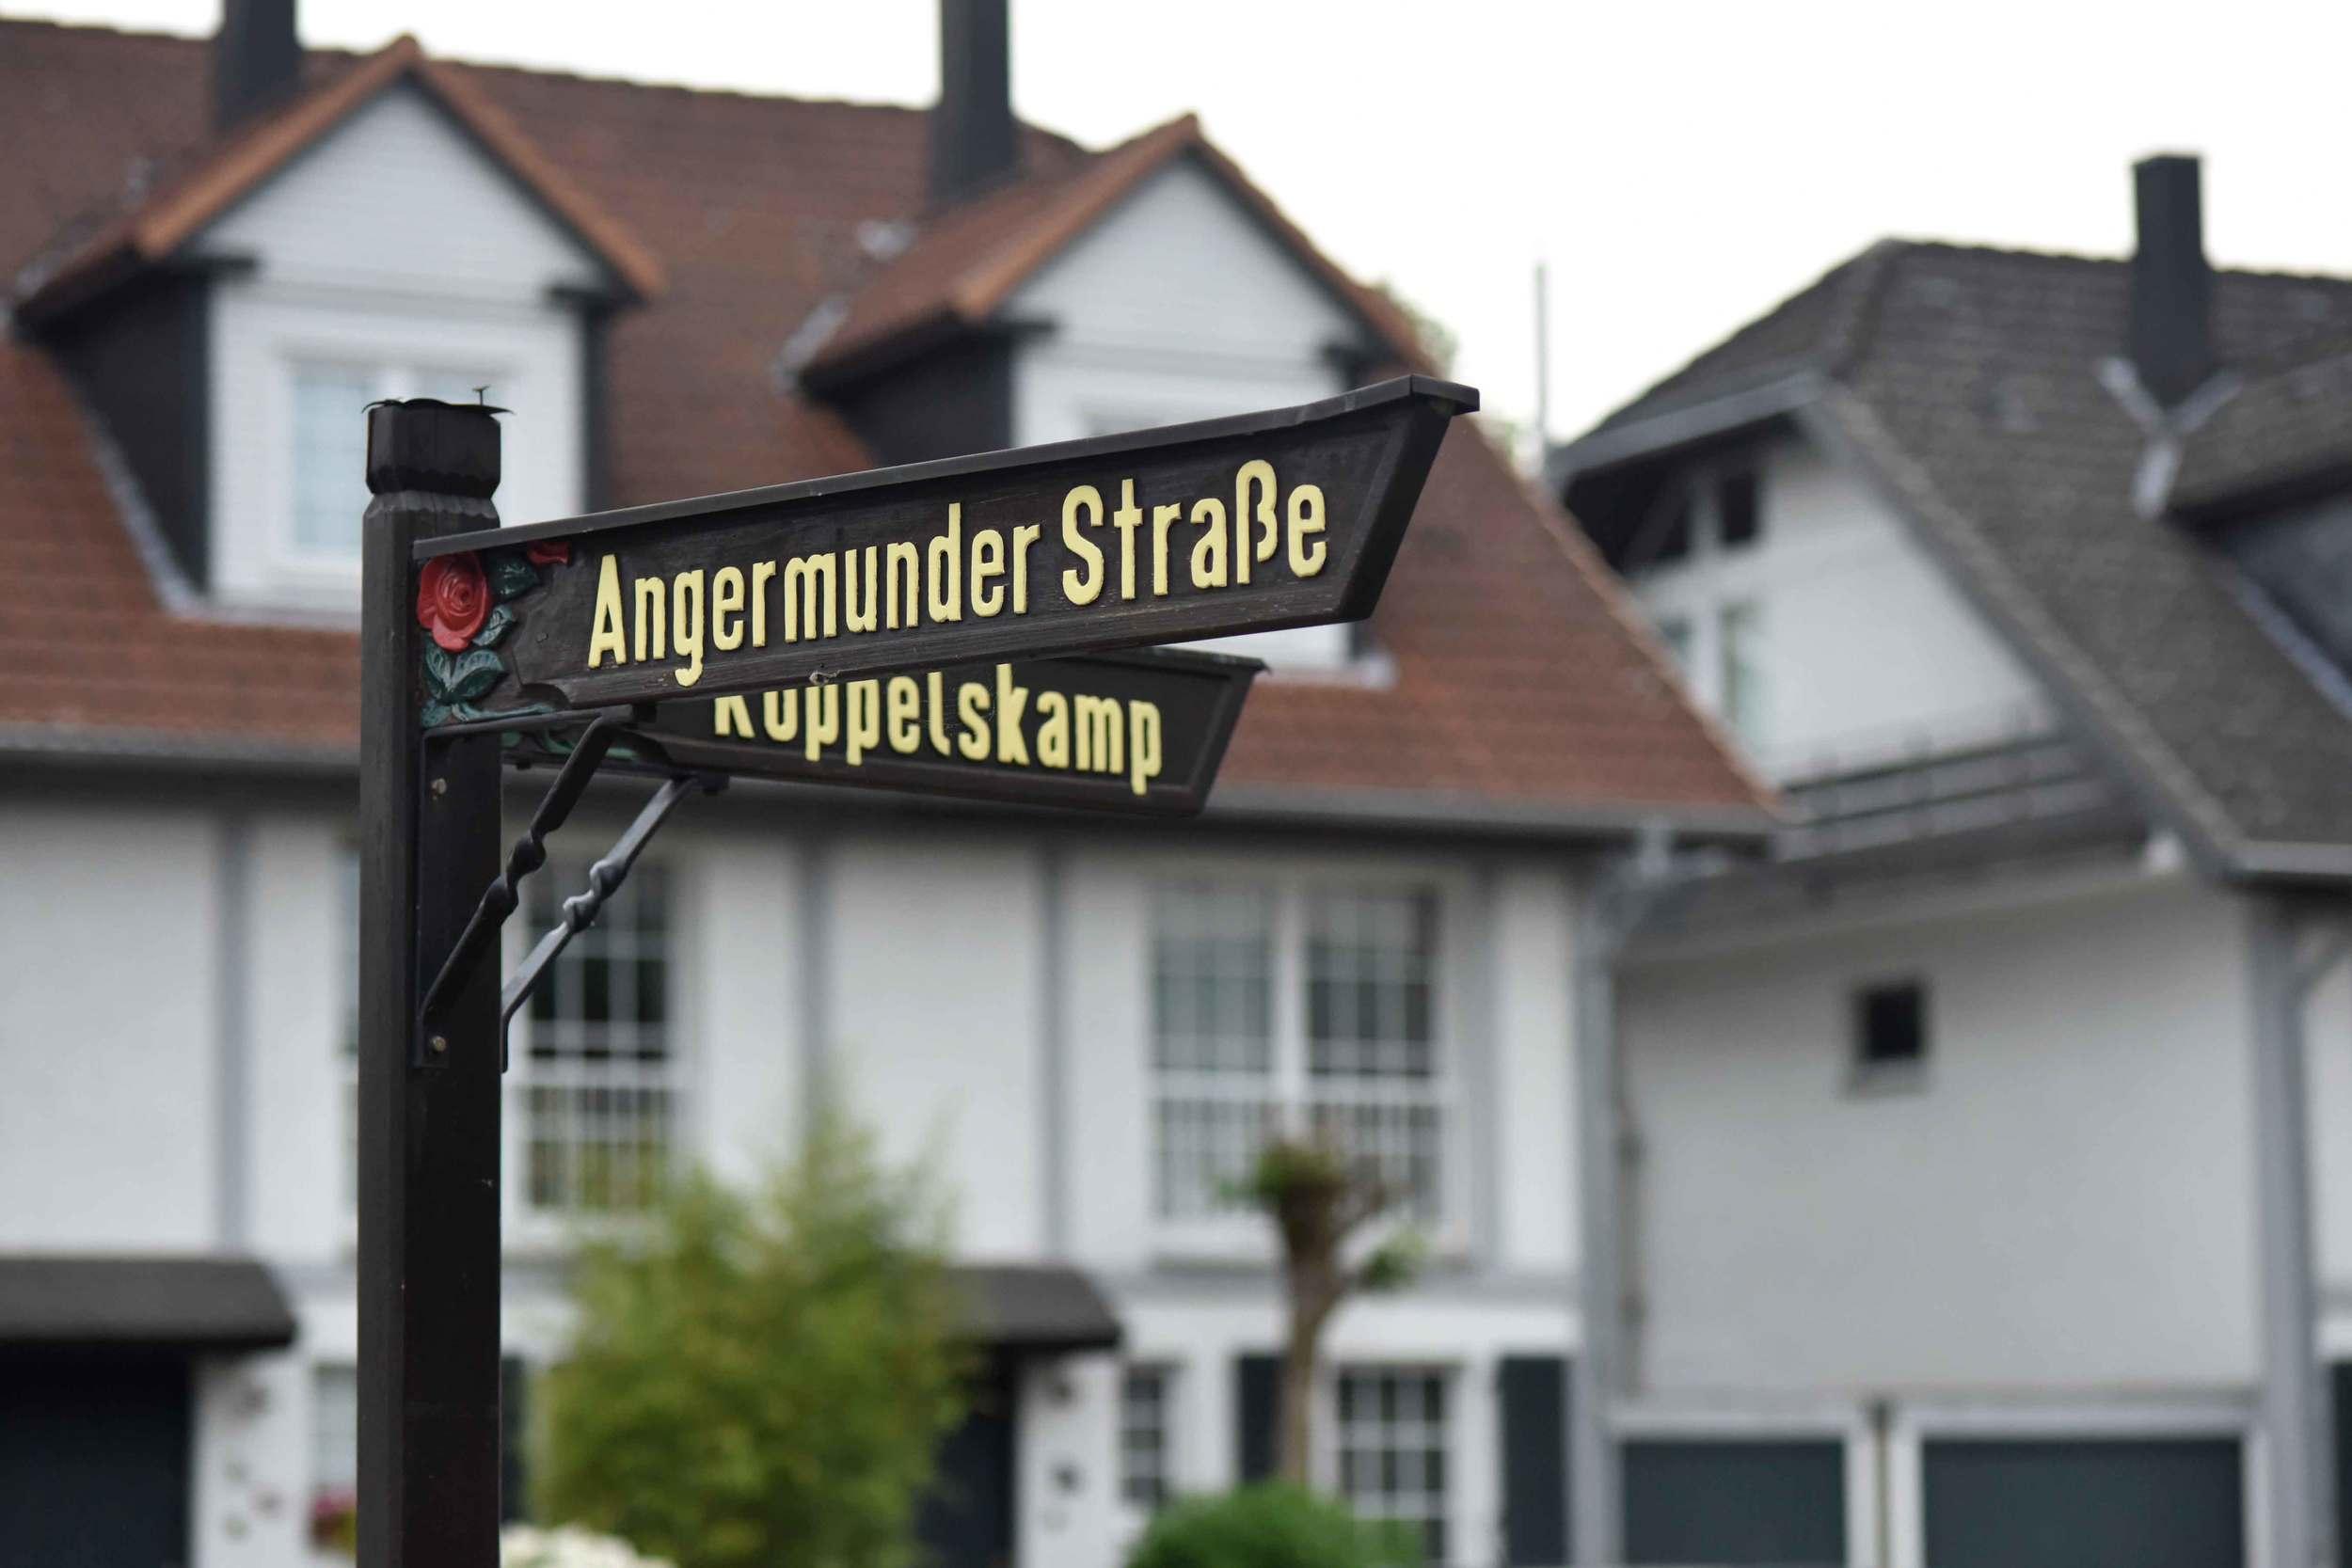 Angermunder Straße signboard, village near Düsseldorf, Germany. Image©sourcingstyle.com, Photo: Nicola Nolting.